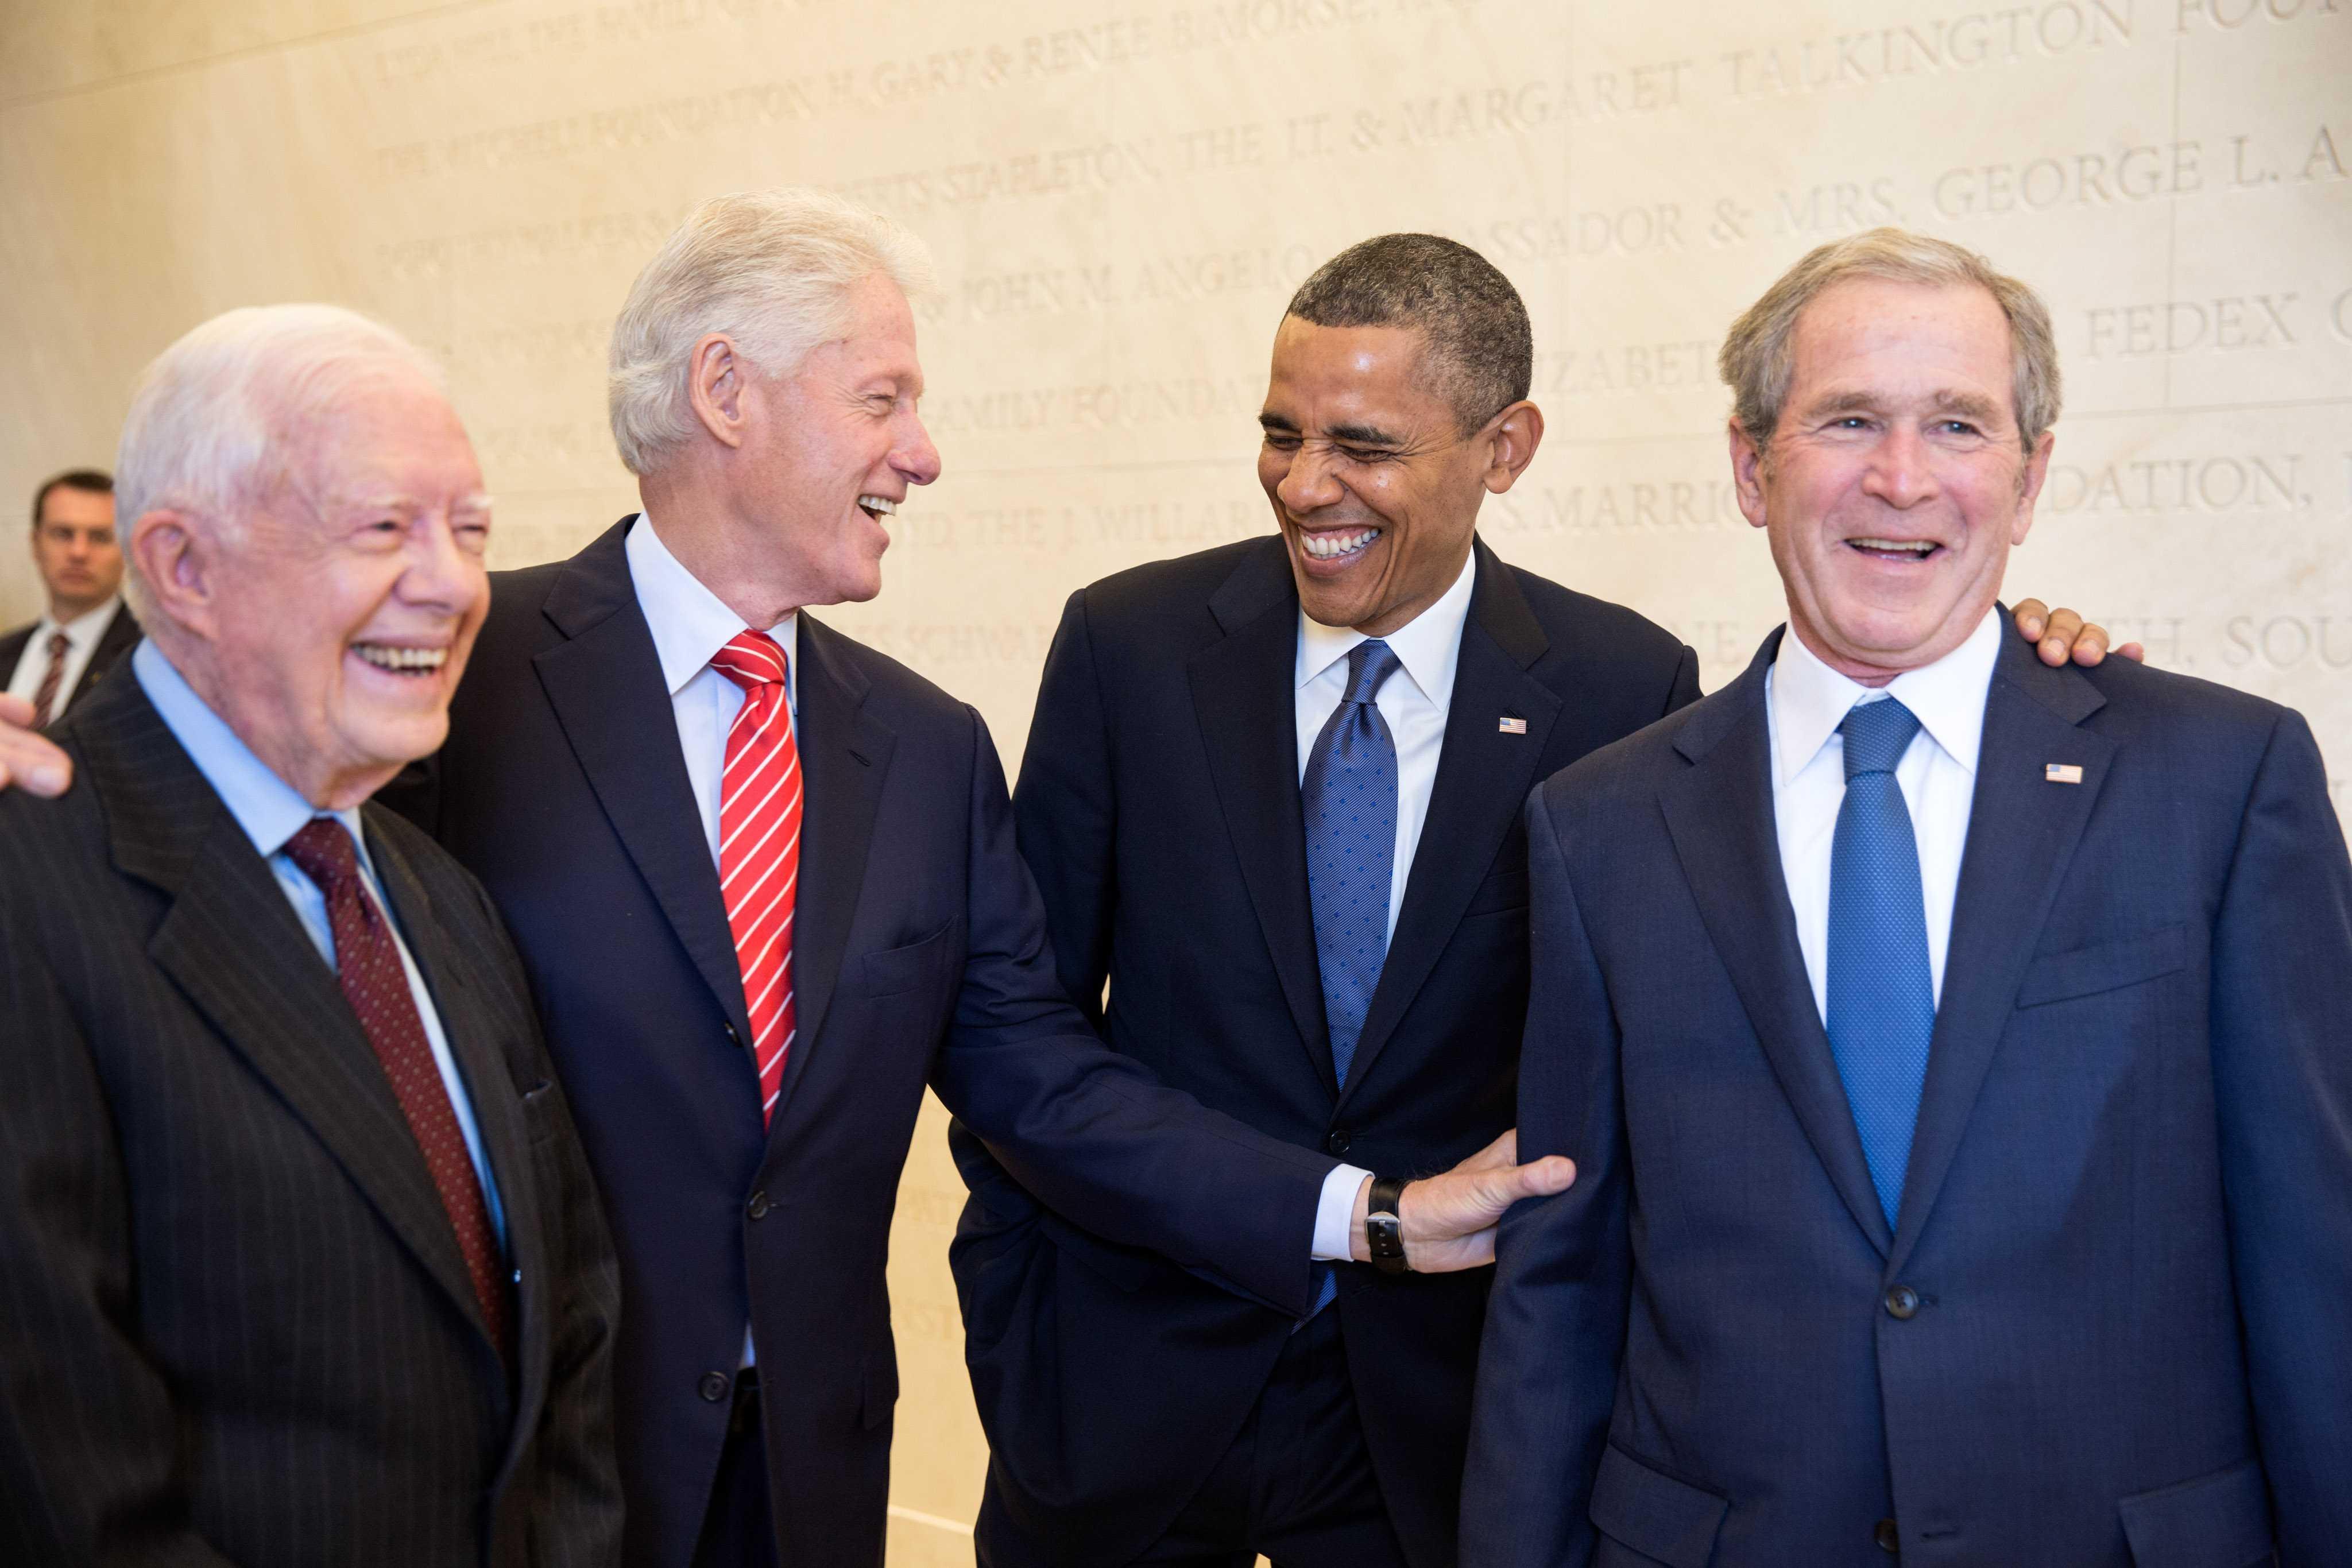 Courtesty of: https://upload.wikimedia.org/wikipedia/commons/b/b3/Four_U.S._presidents_in_2013.jpg